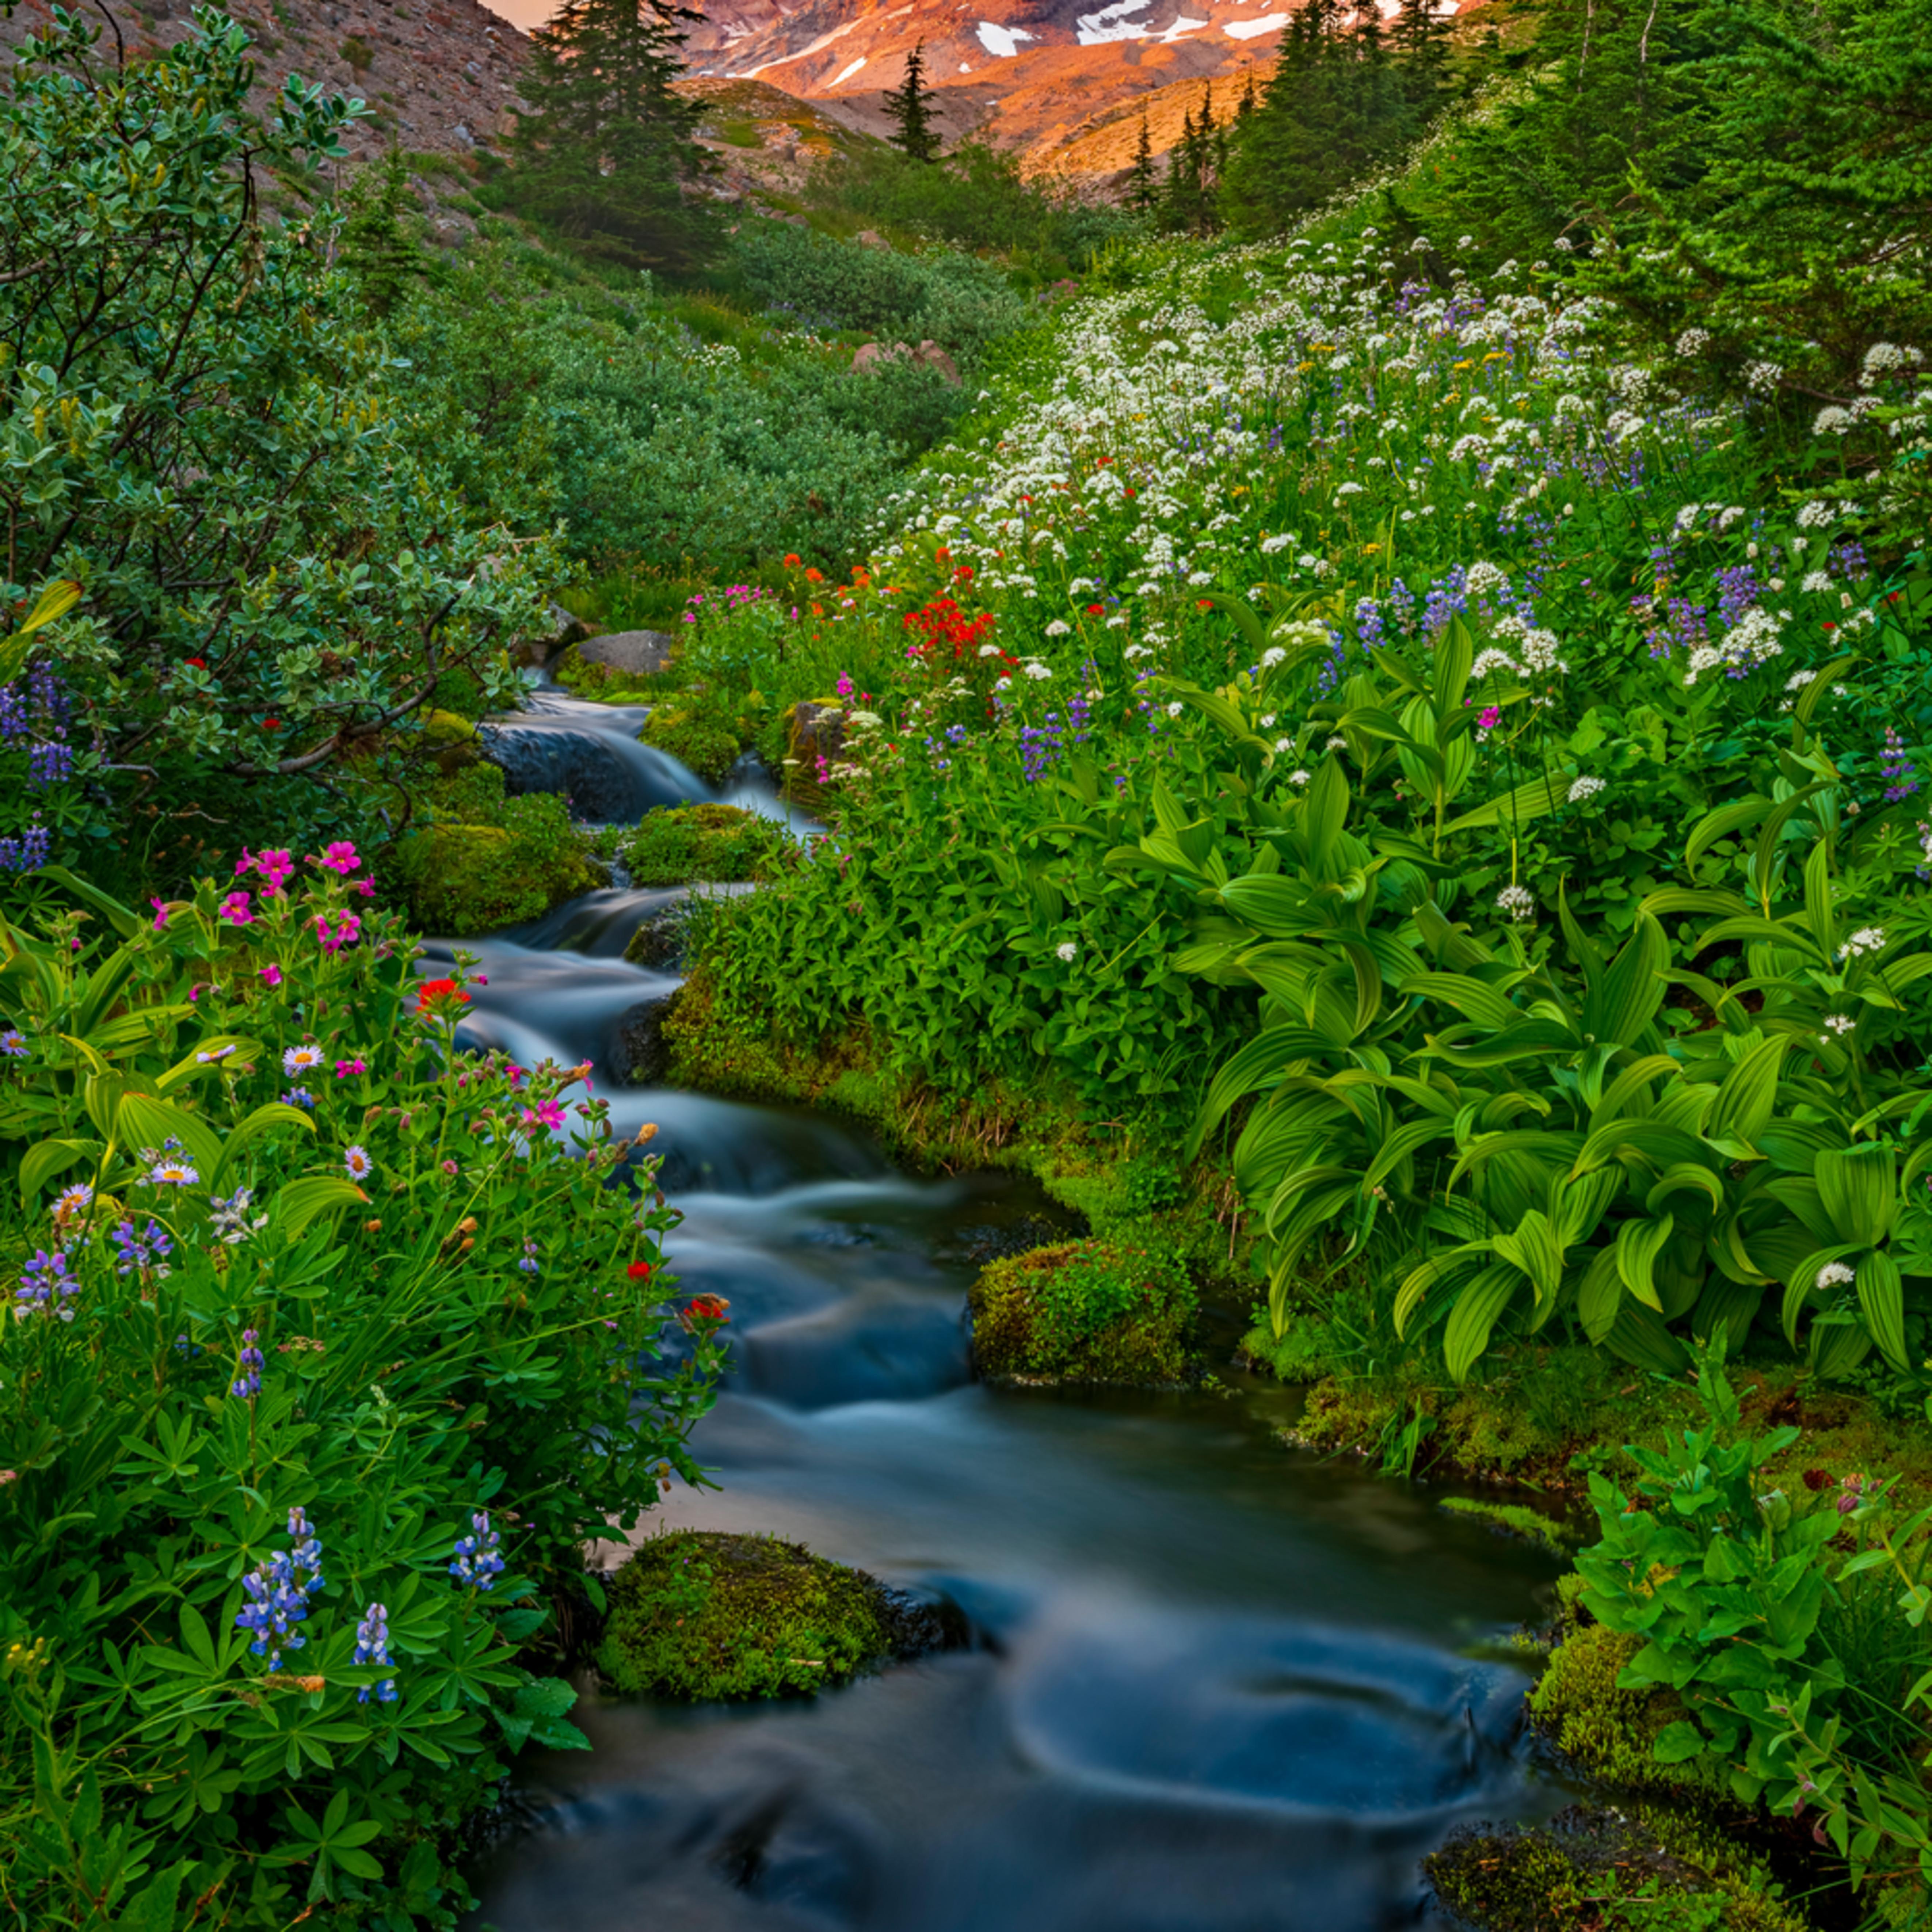 Flowing paradise rprtzv